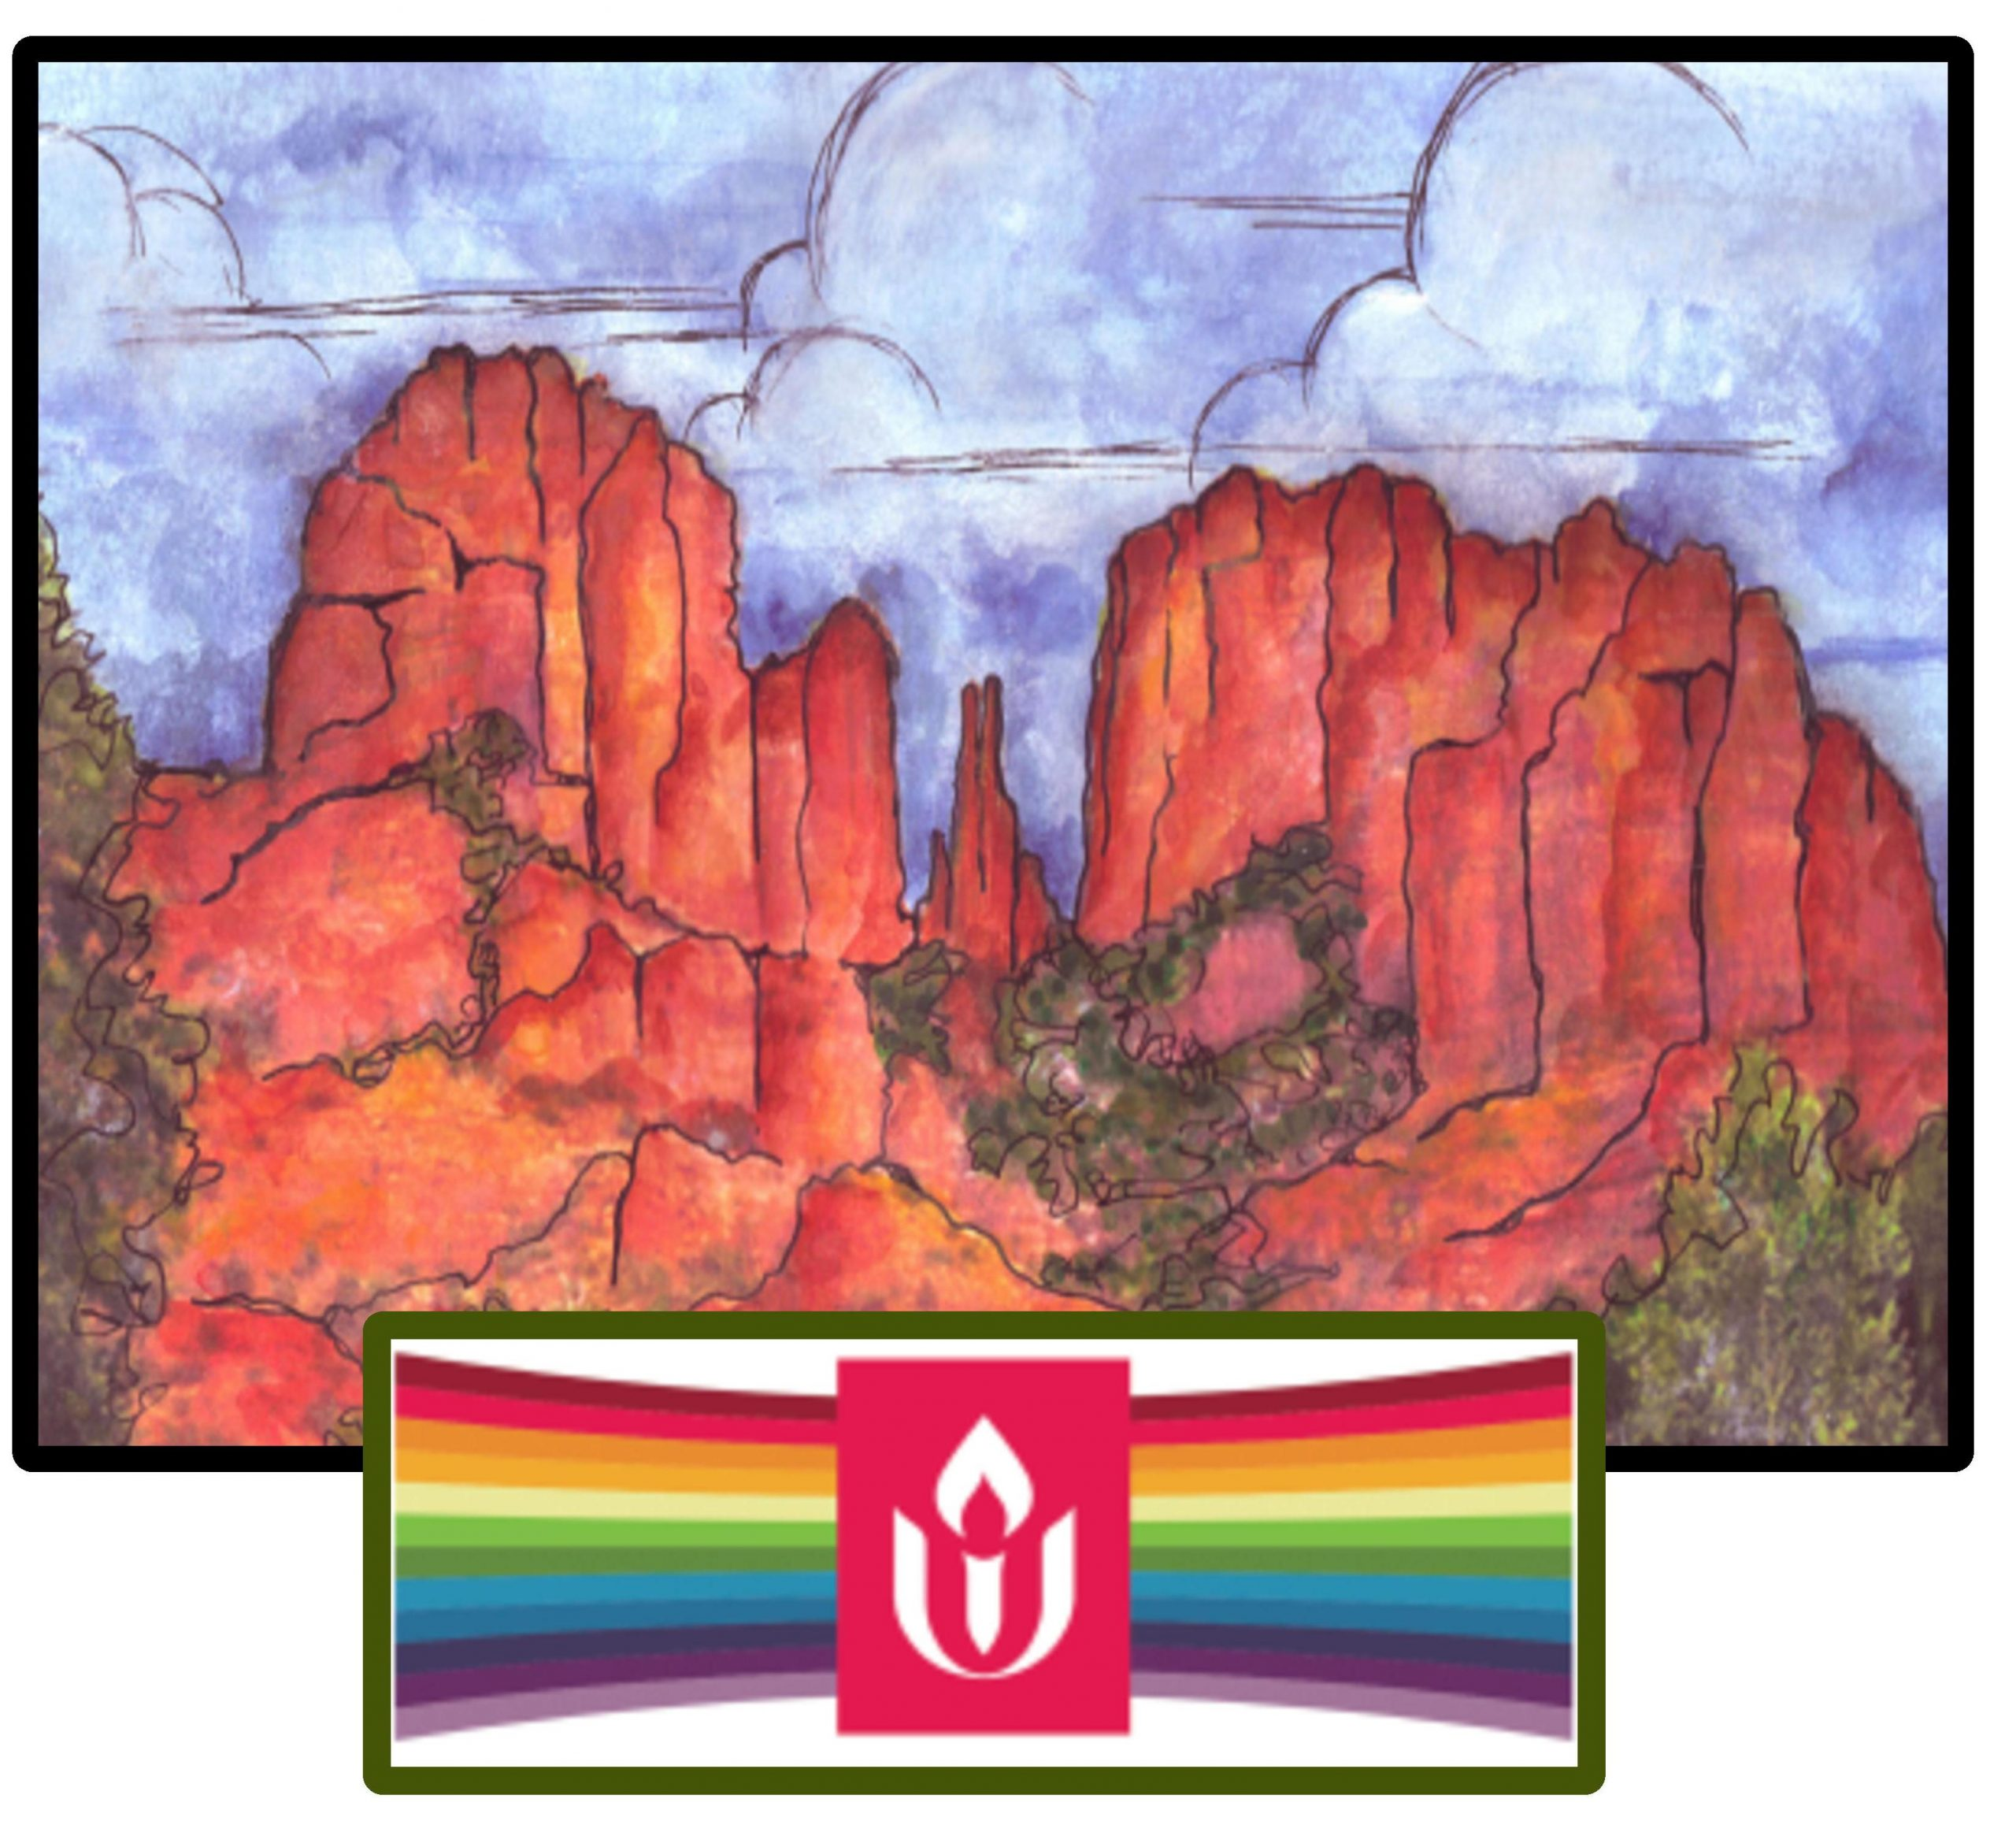 Sedona Unitarian Universalist Fellowship